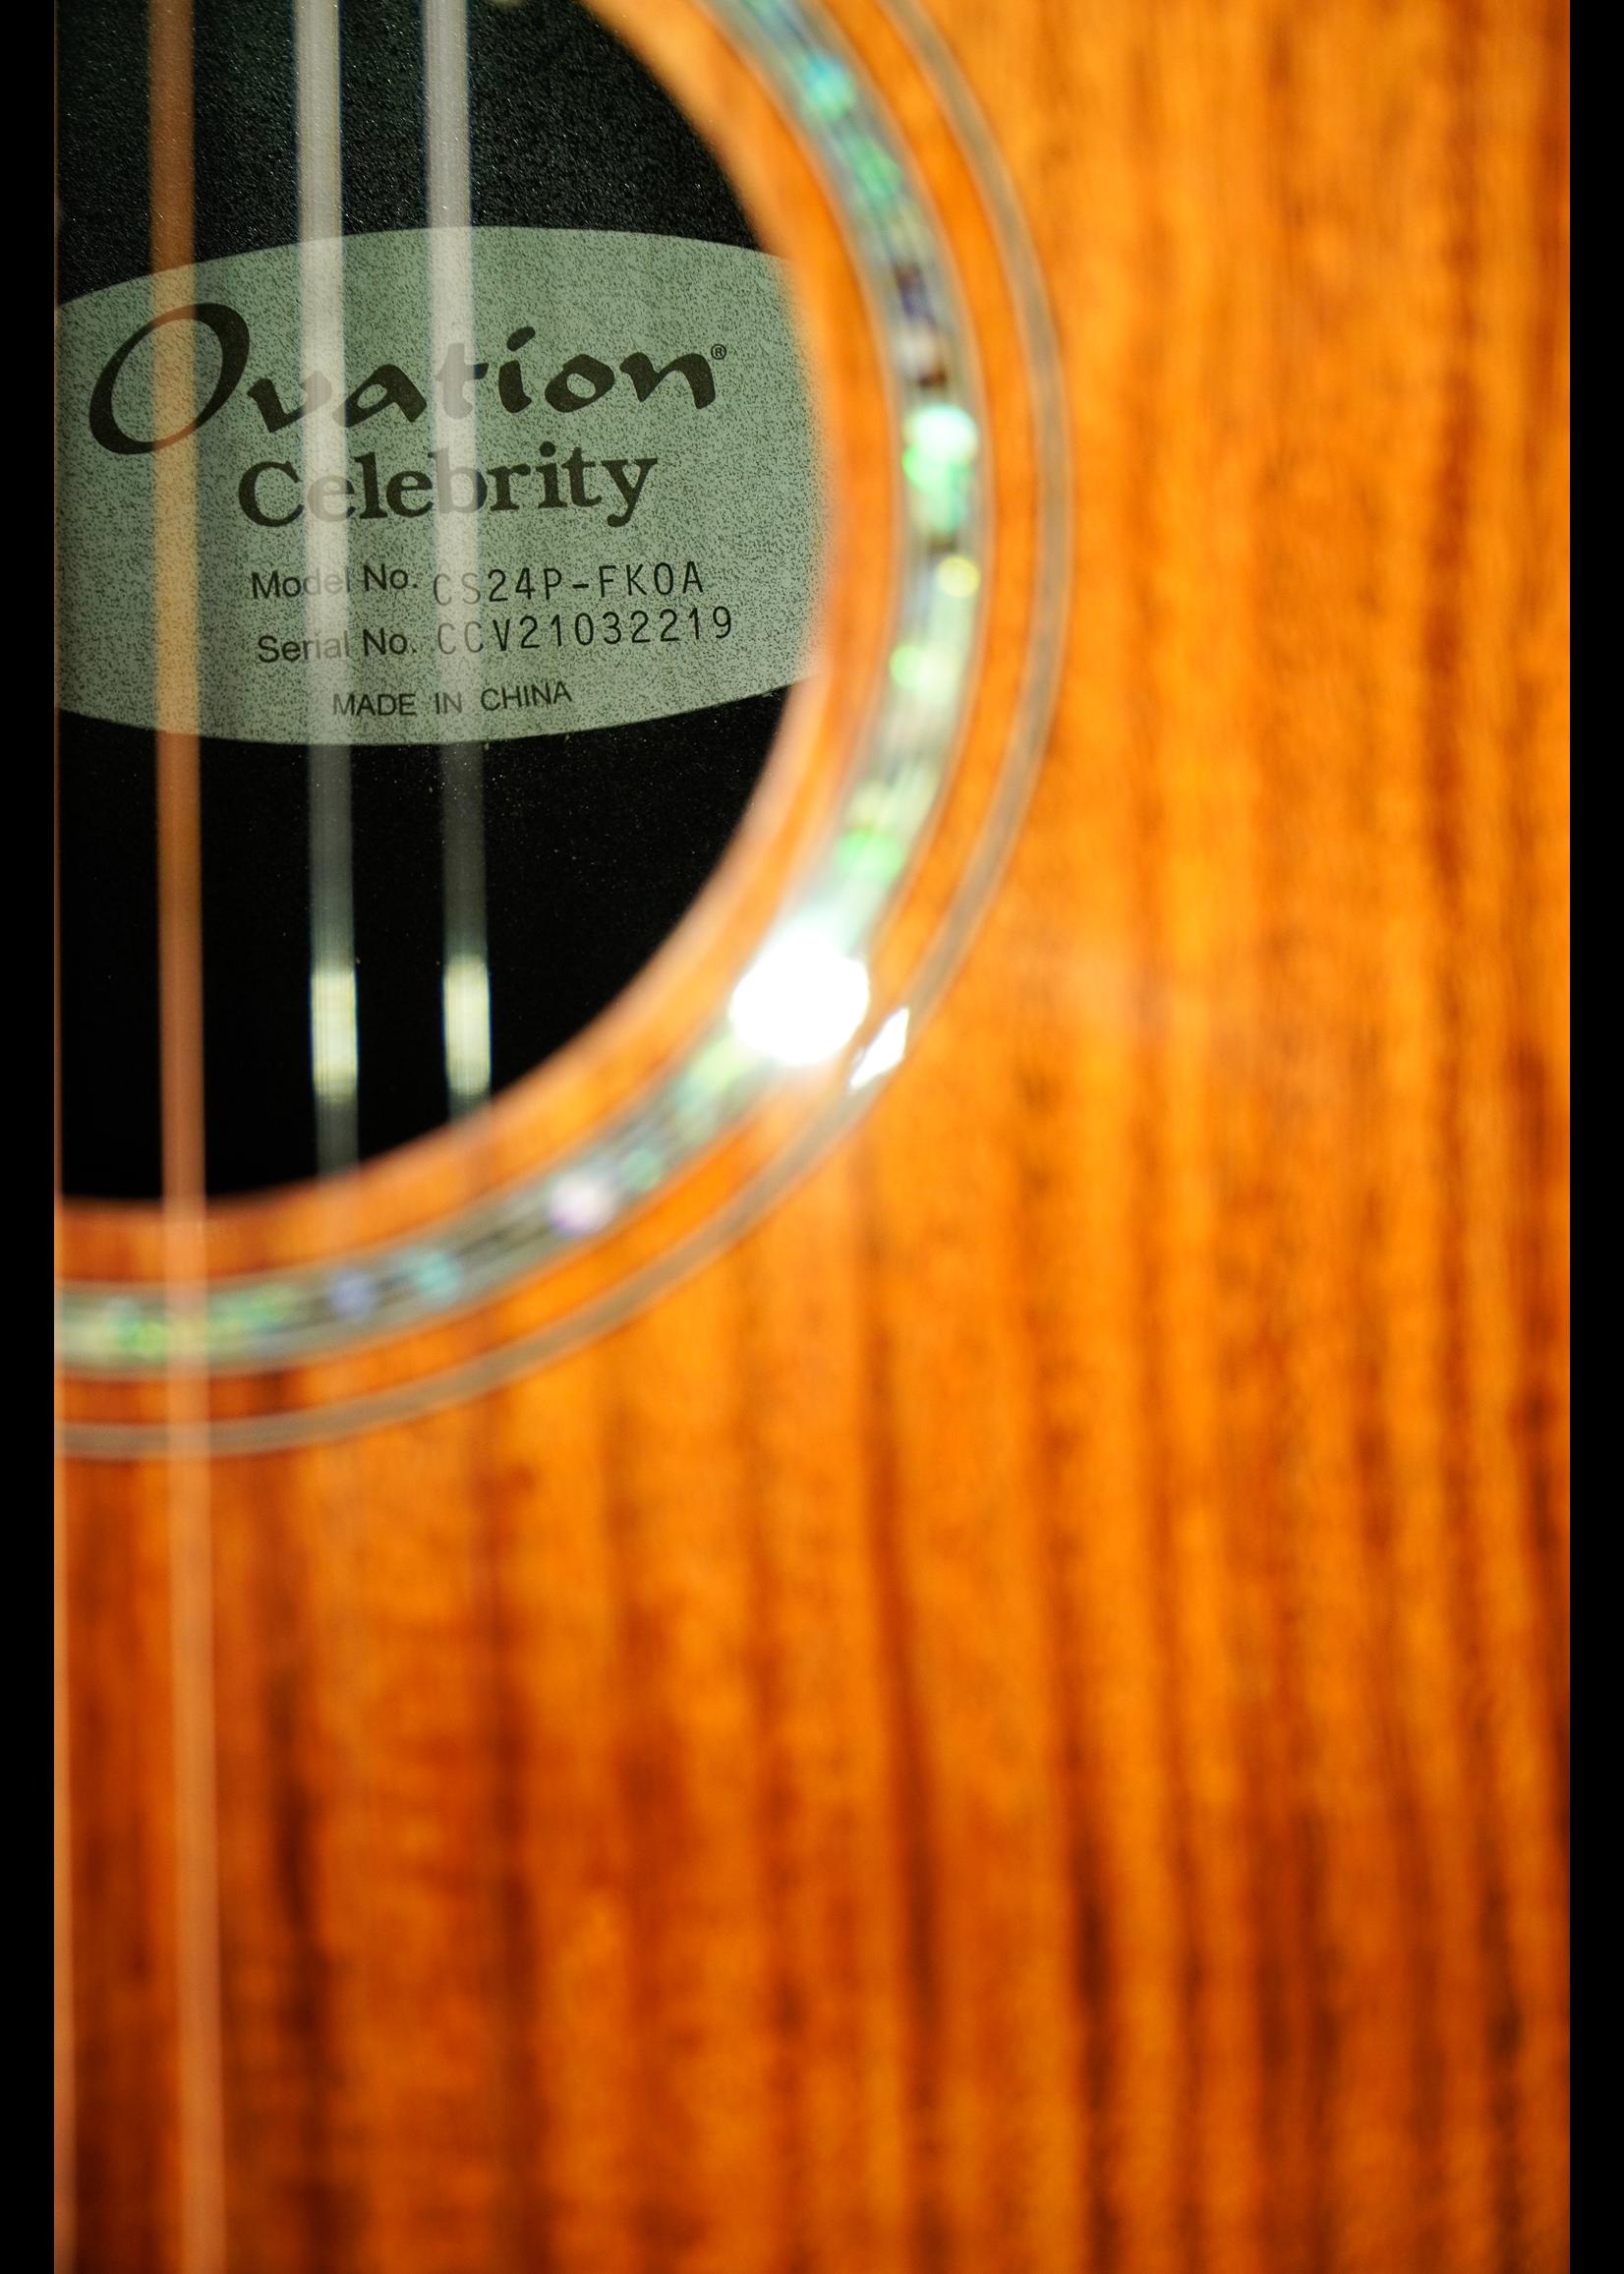 Ovation Ovation Celebrity CS24P-FKOA